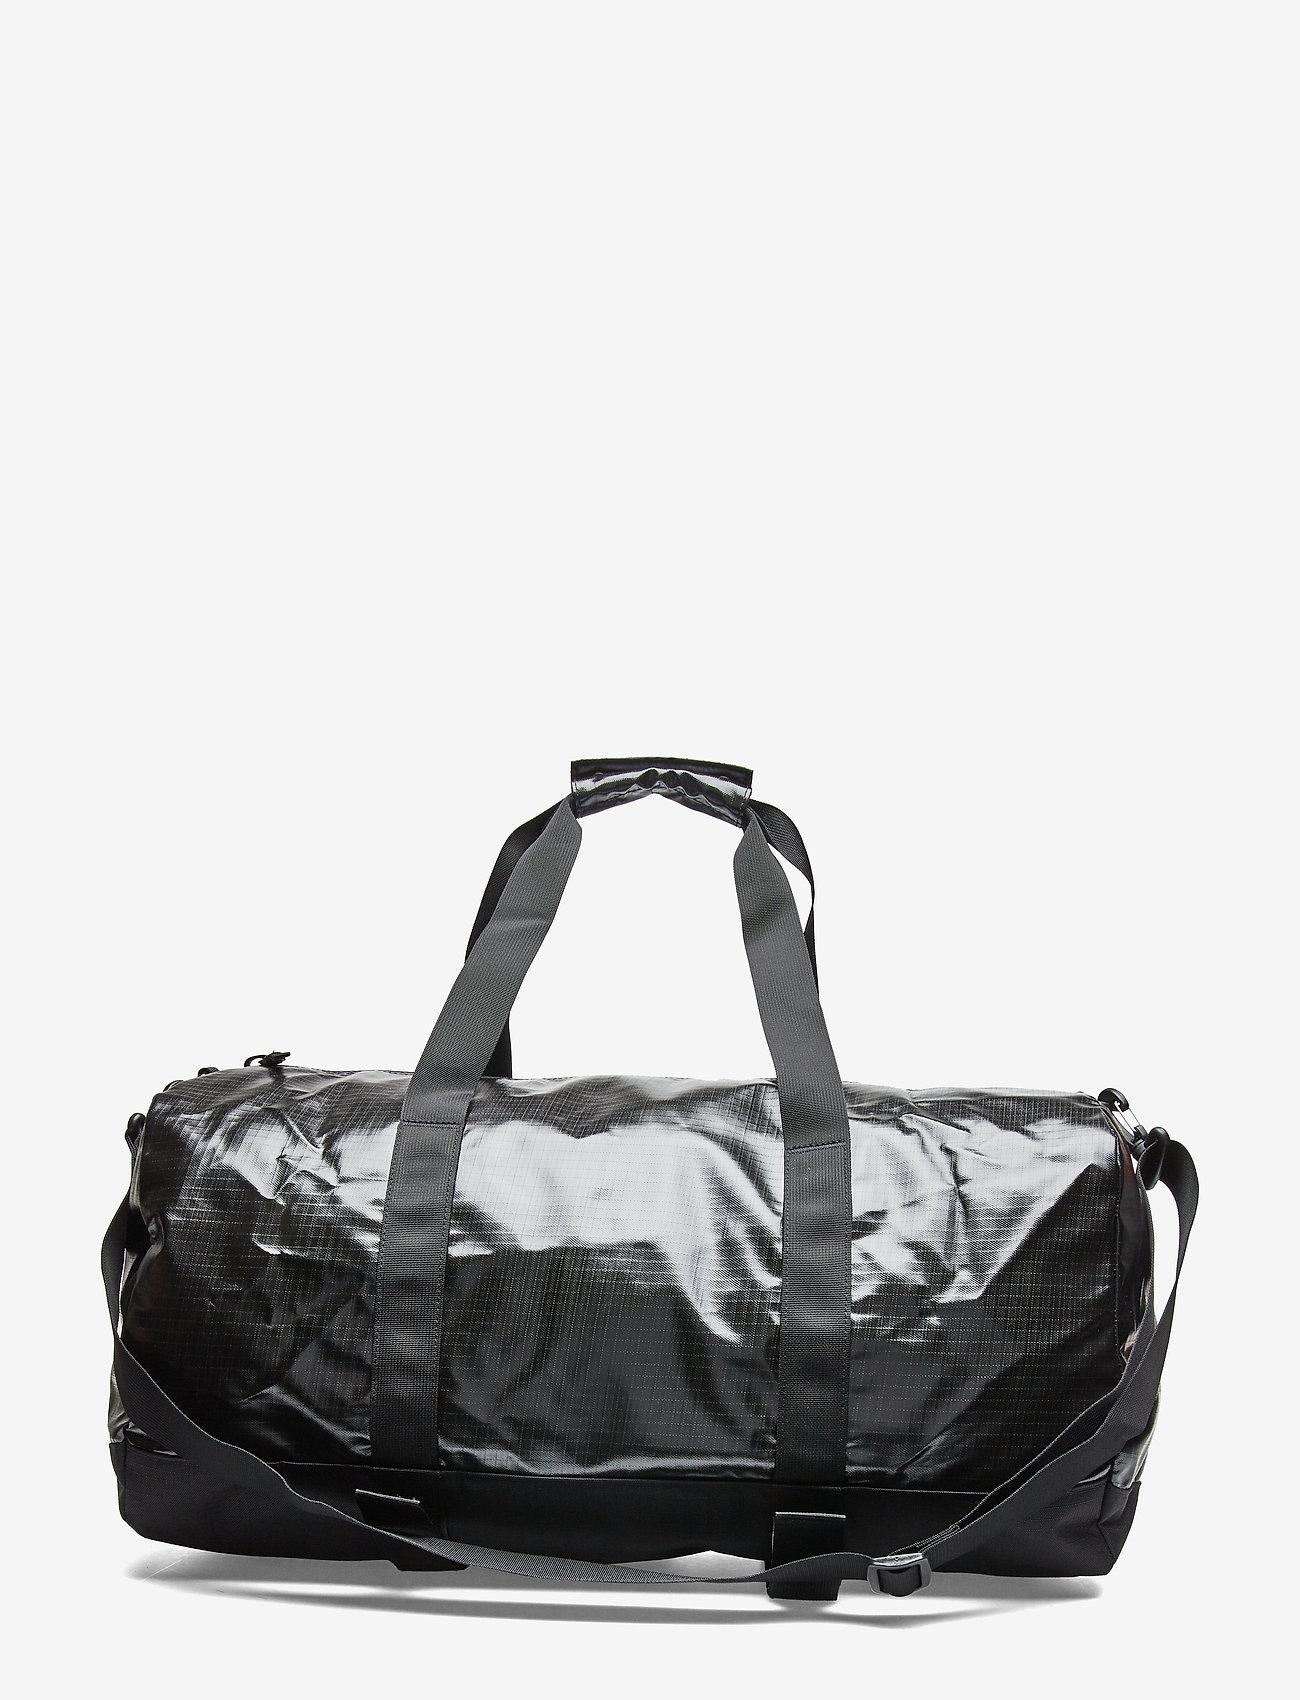 adidas Performance - NEWDUFFEL - sacs de sport - black/bgreen/hirblu/w - 0